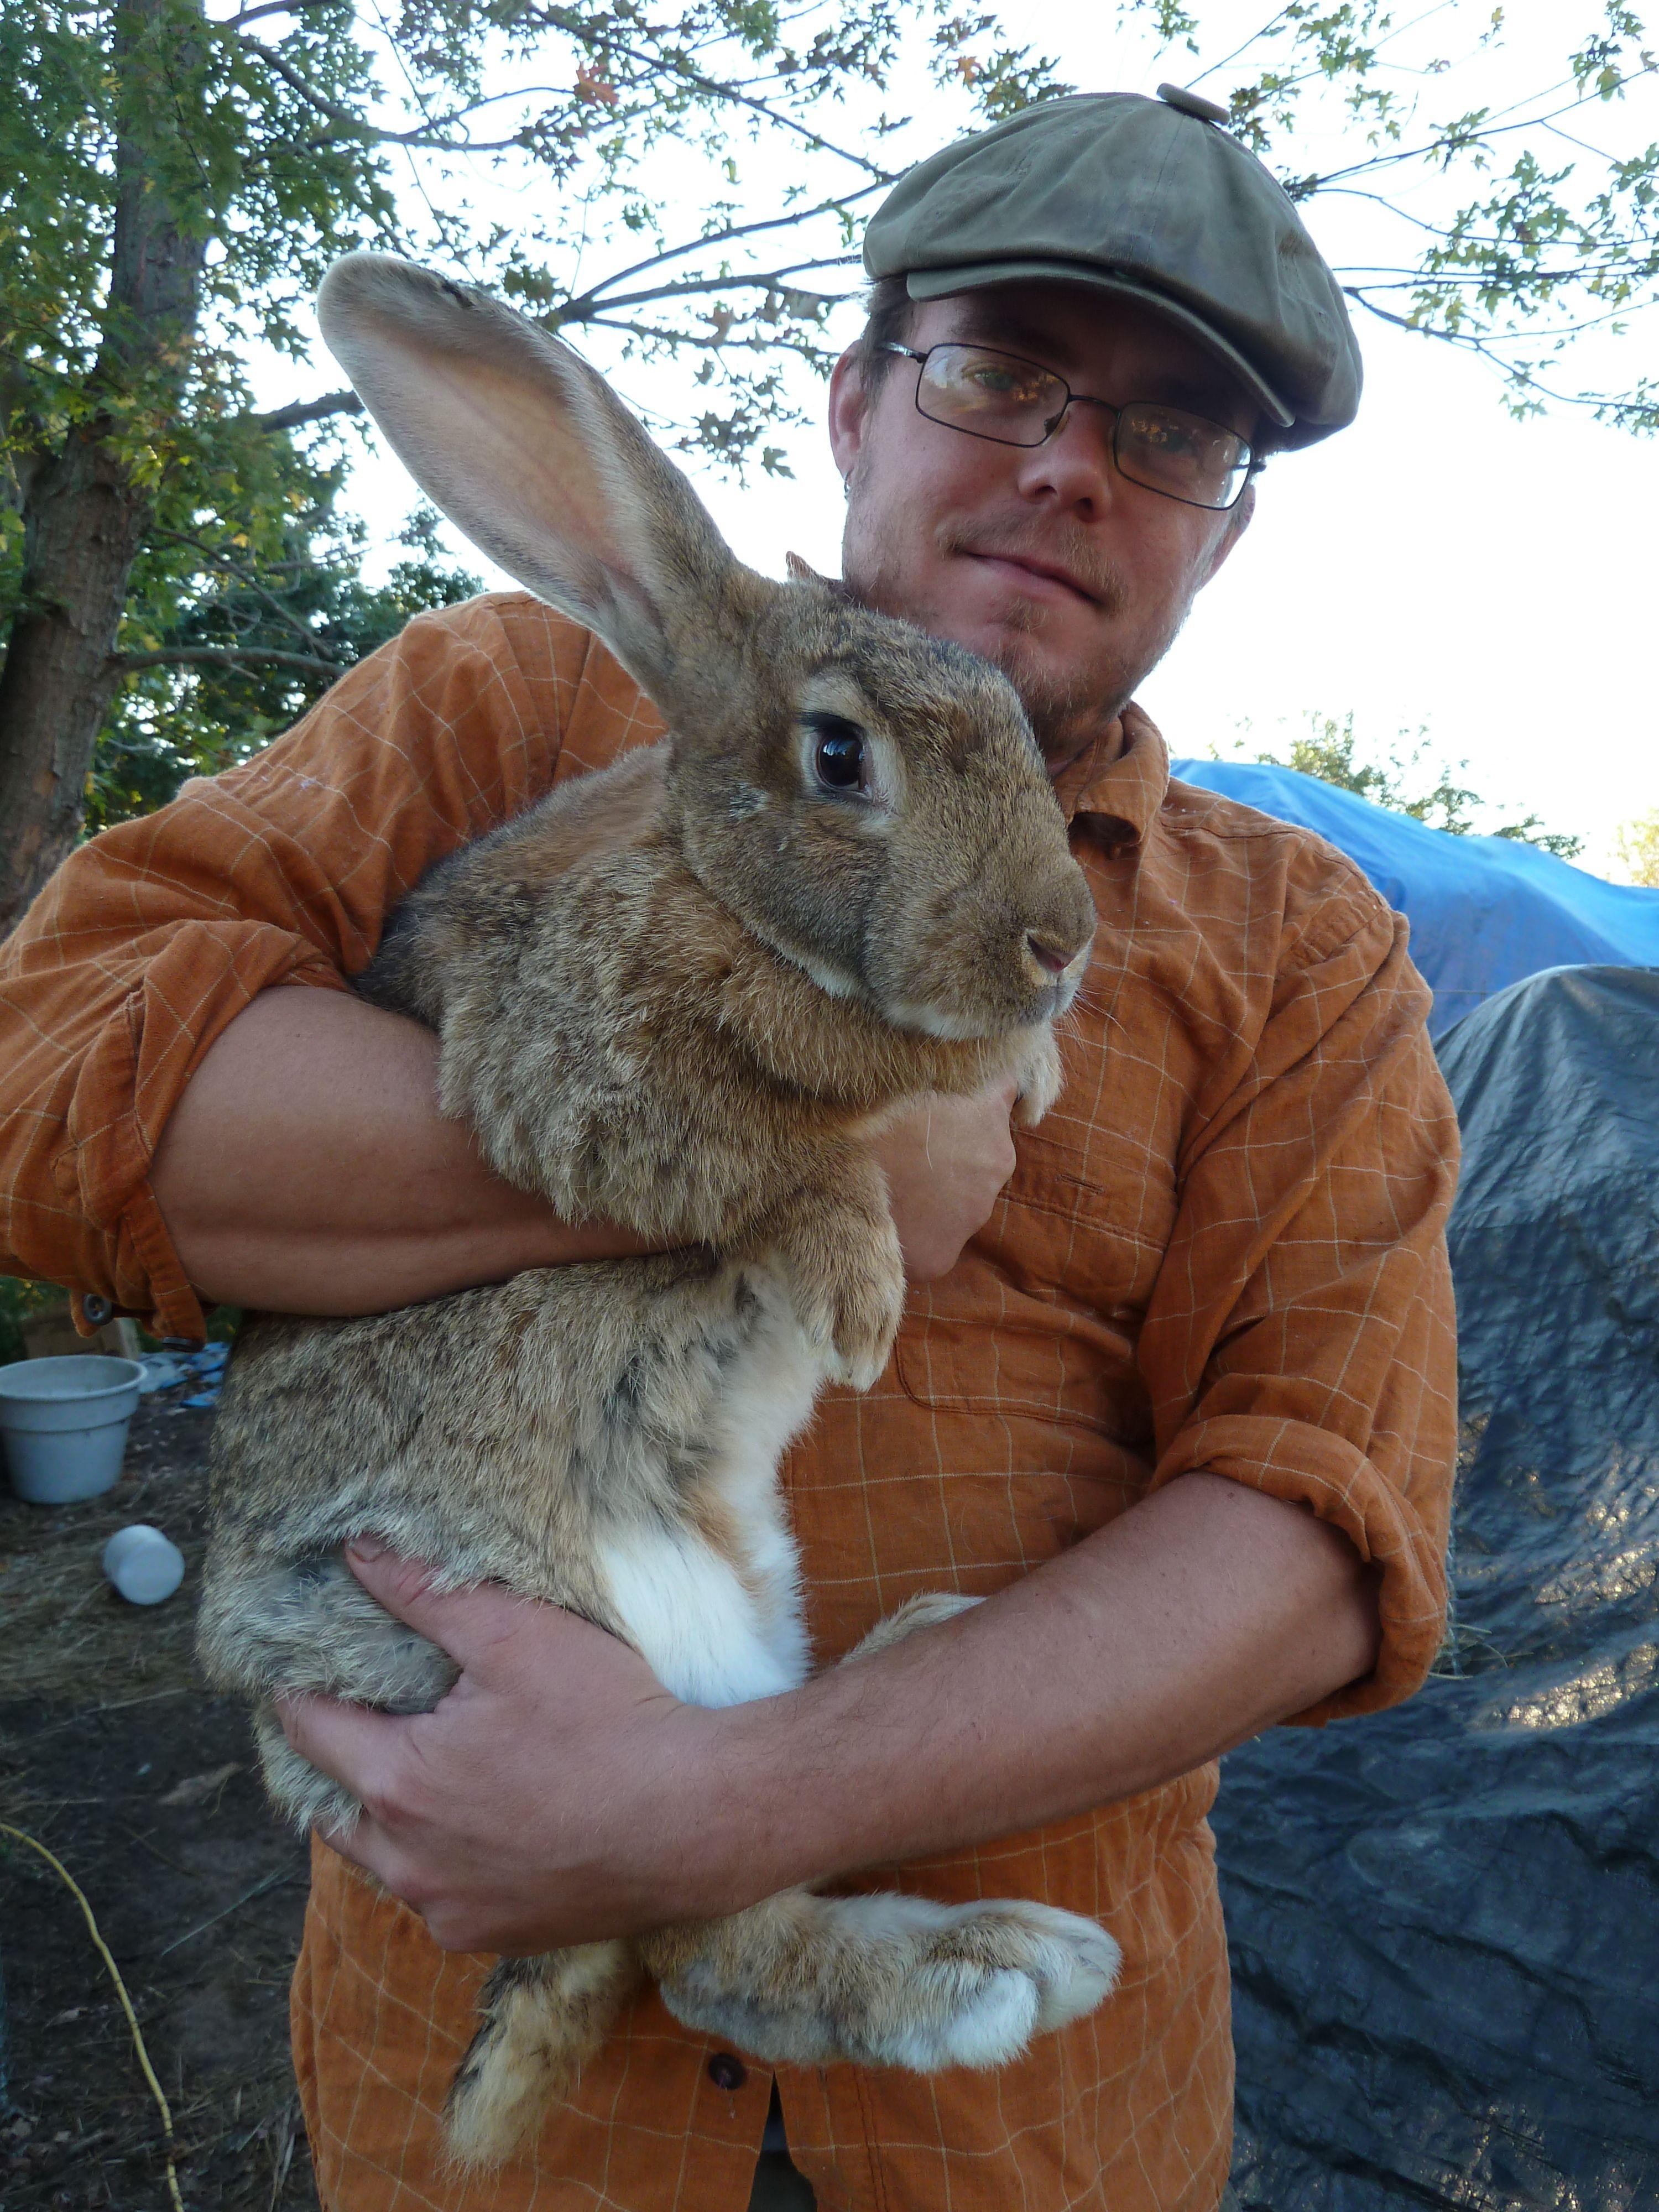 Flemish Bunny For Sale : flemish, bunny, Flemish, Giant, Rabbits, Sandy,, GIANT, Rabbit, Life,, HUGE!, Hopefully, Rabbit,, Animals